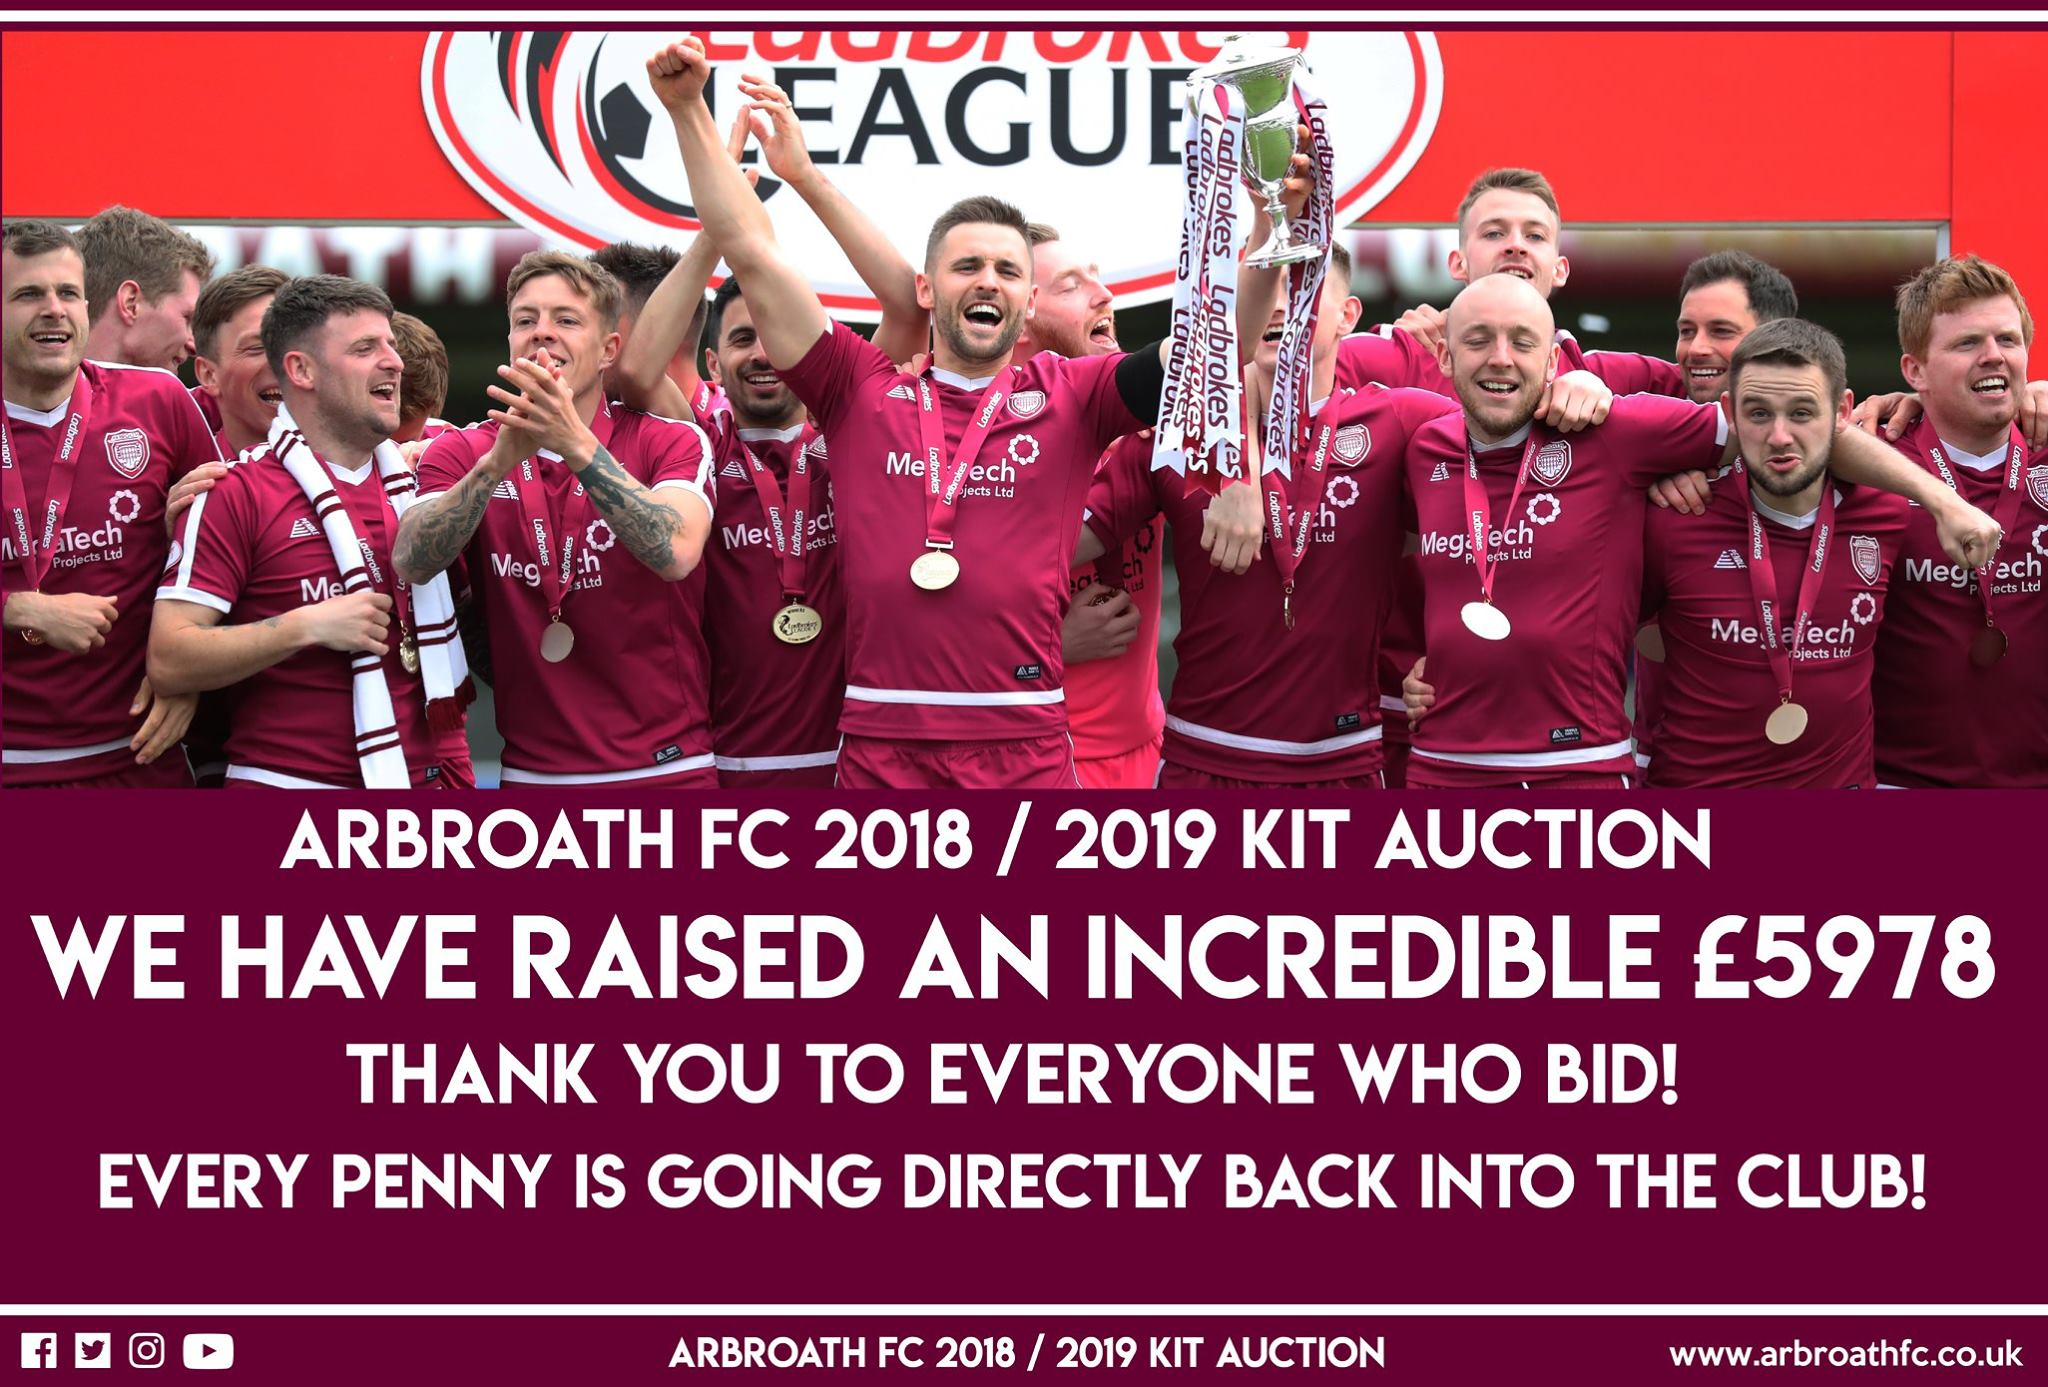 6e2b99b4b8f Arbroath FC Kit Auction – £5978